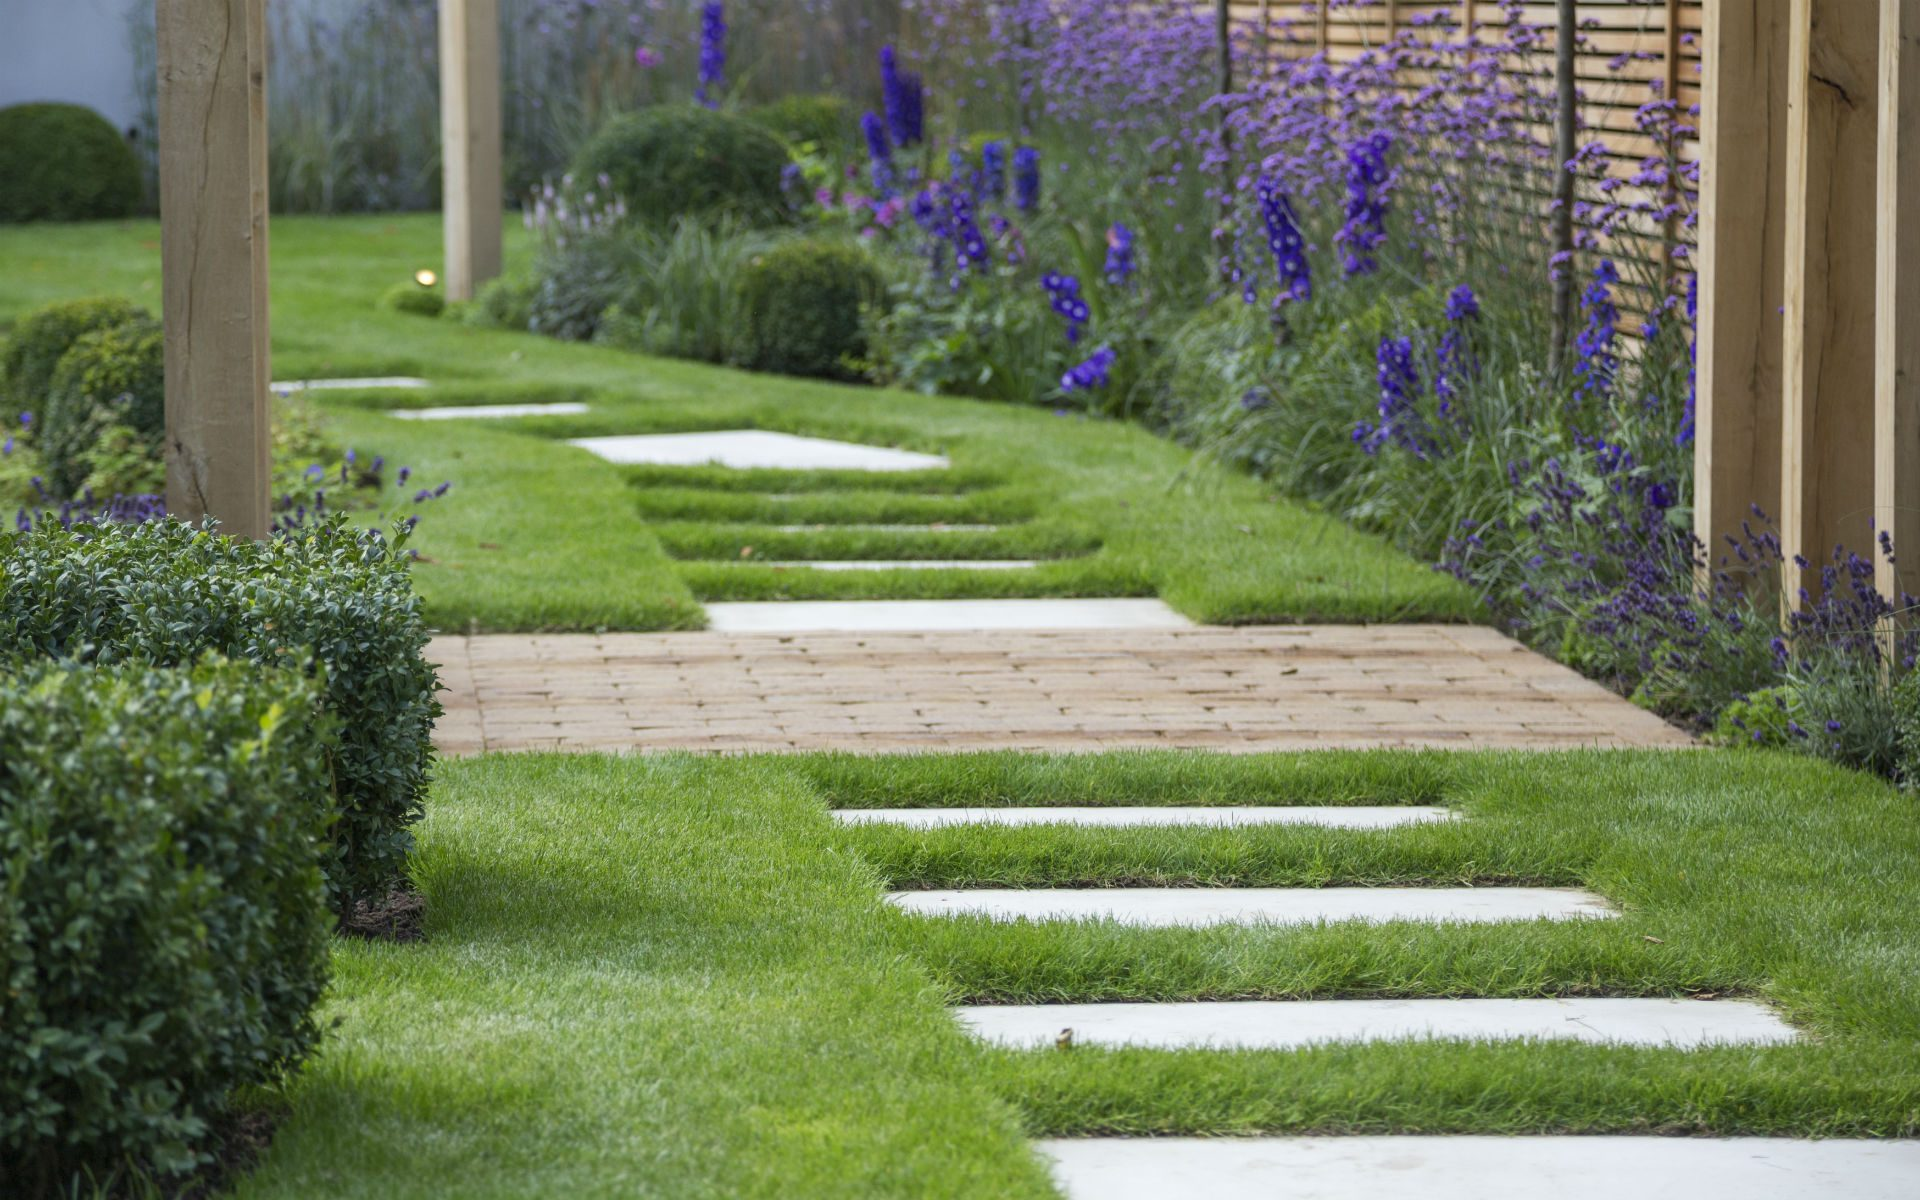 Hard Landscaping Stepping Stone Sandstone Path Pergolas Contemporary Planting Garden Design Essex